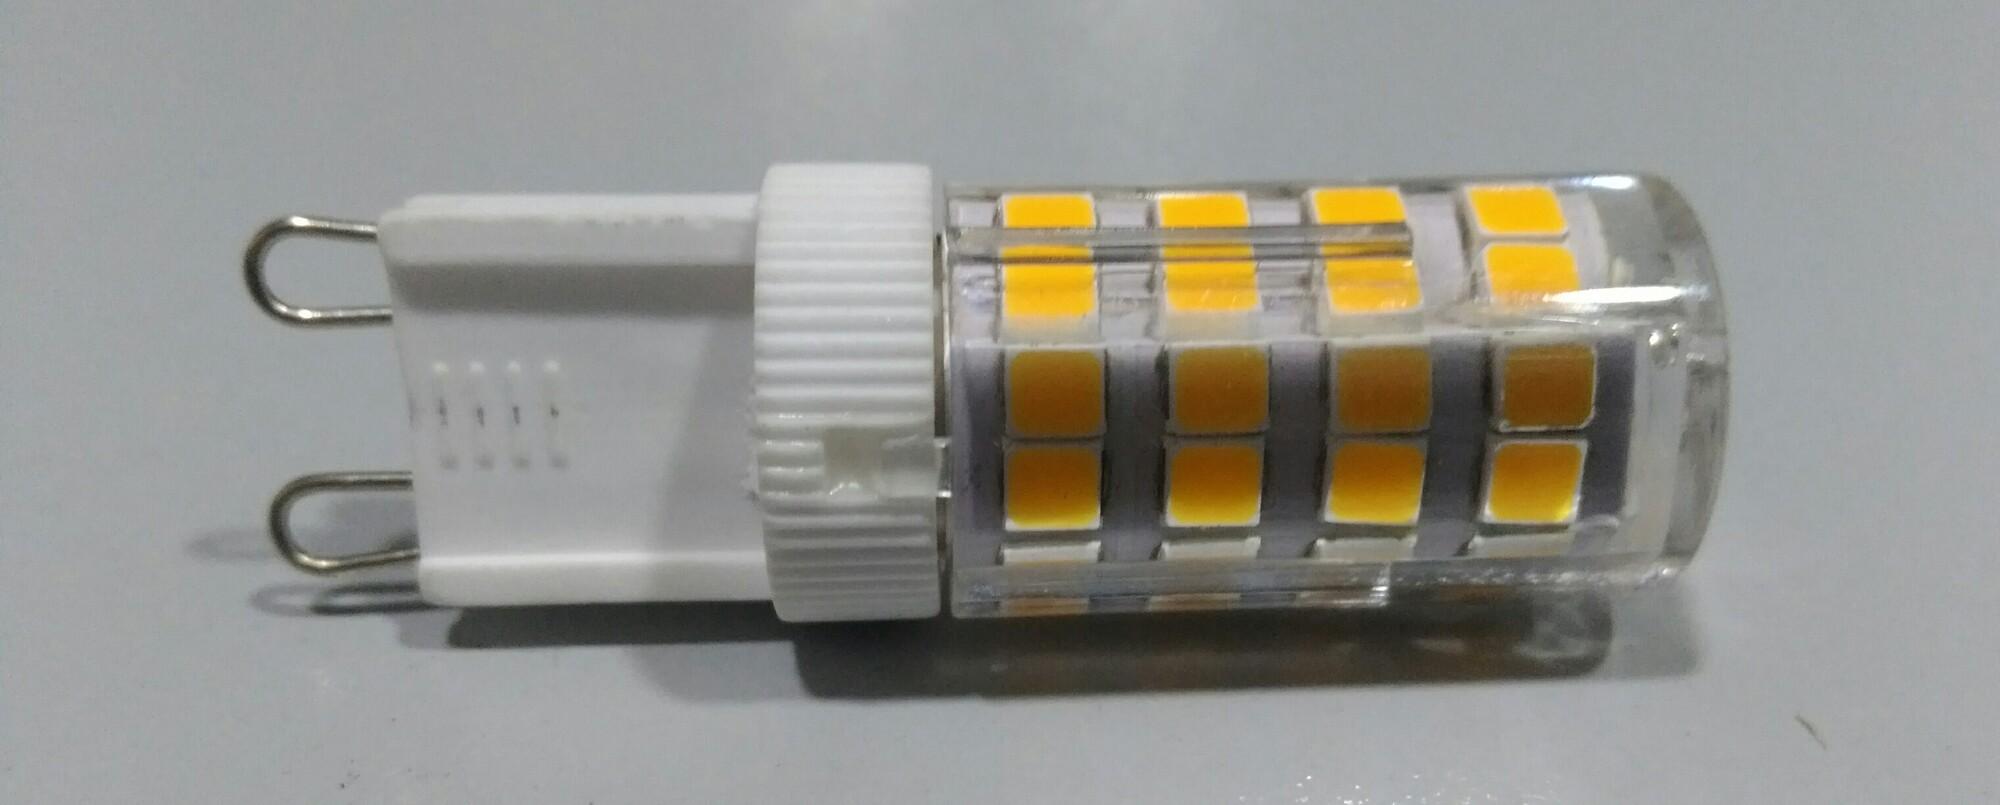 LED G9 4W 350lm 3000K Capsule Transparant